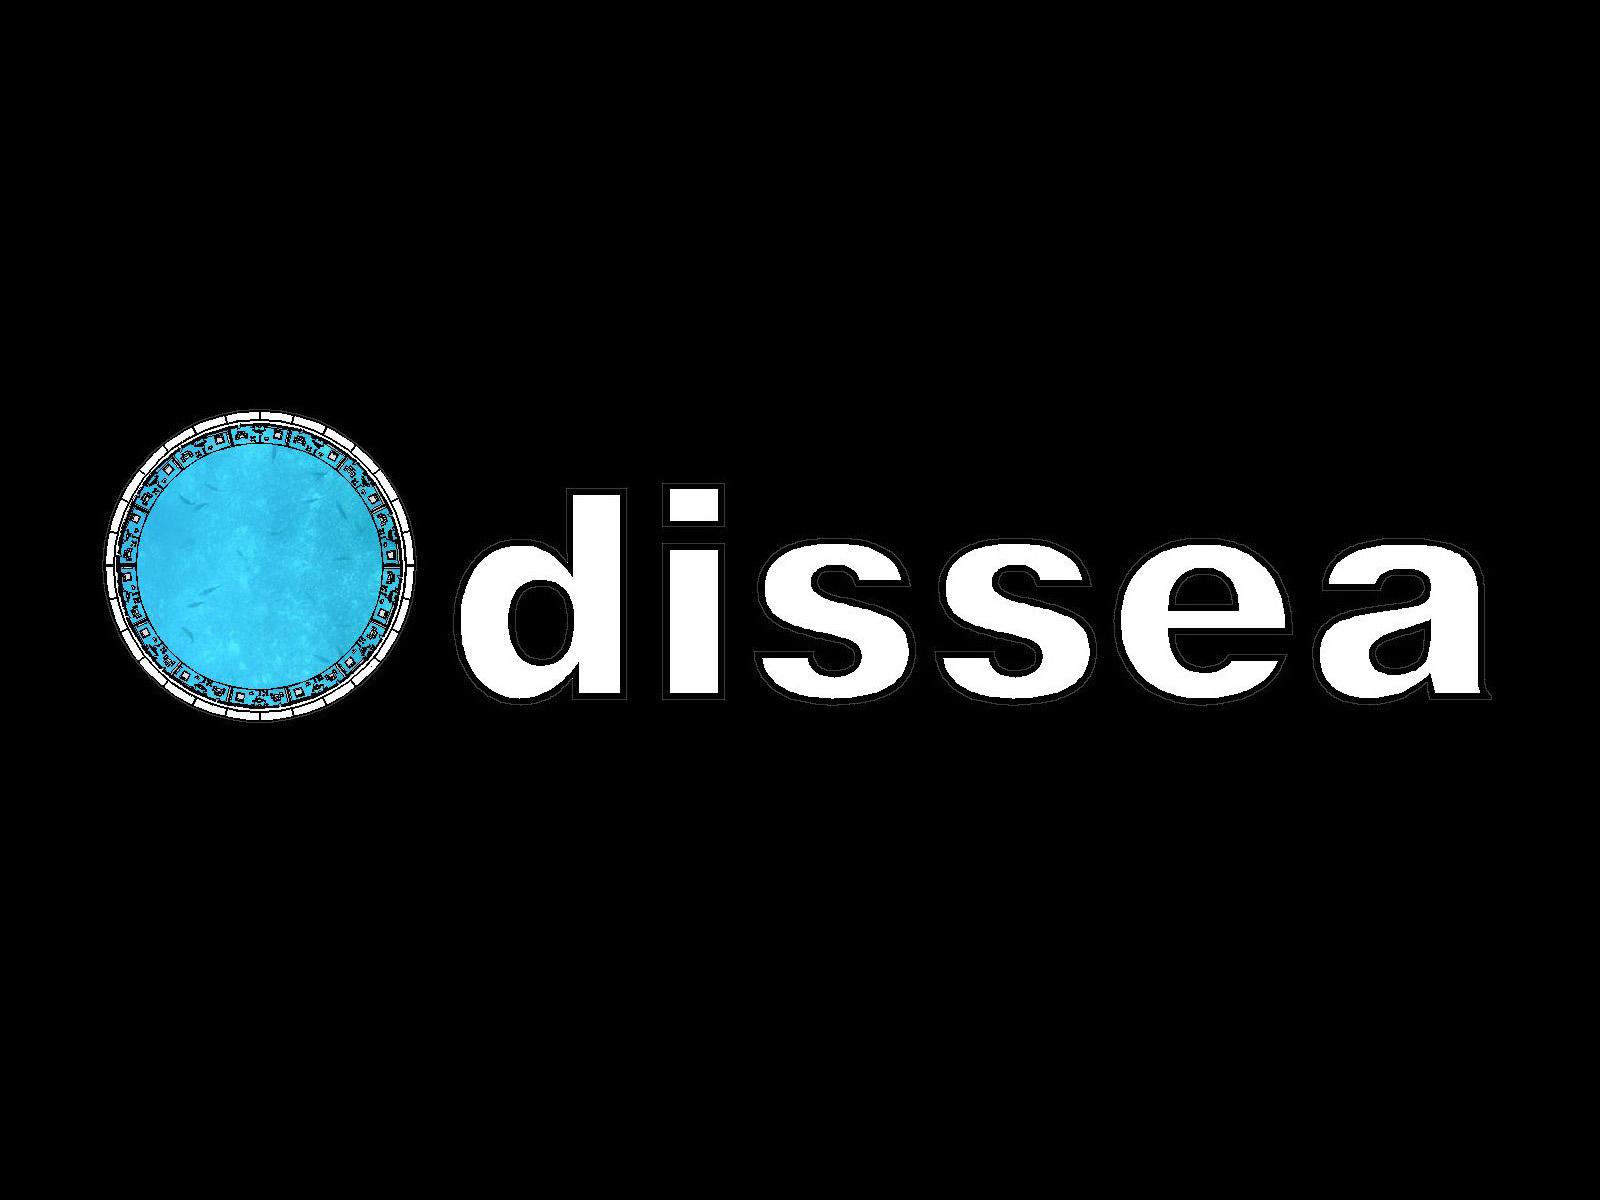 Odissea #6